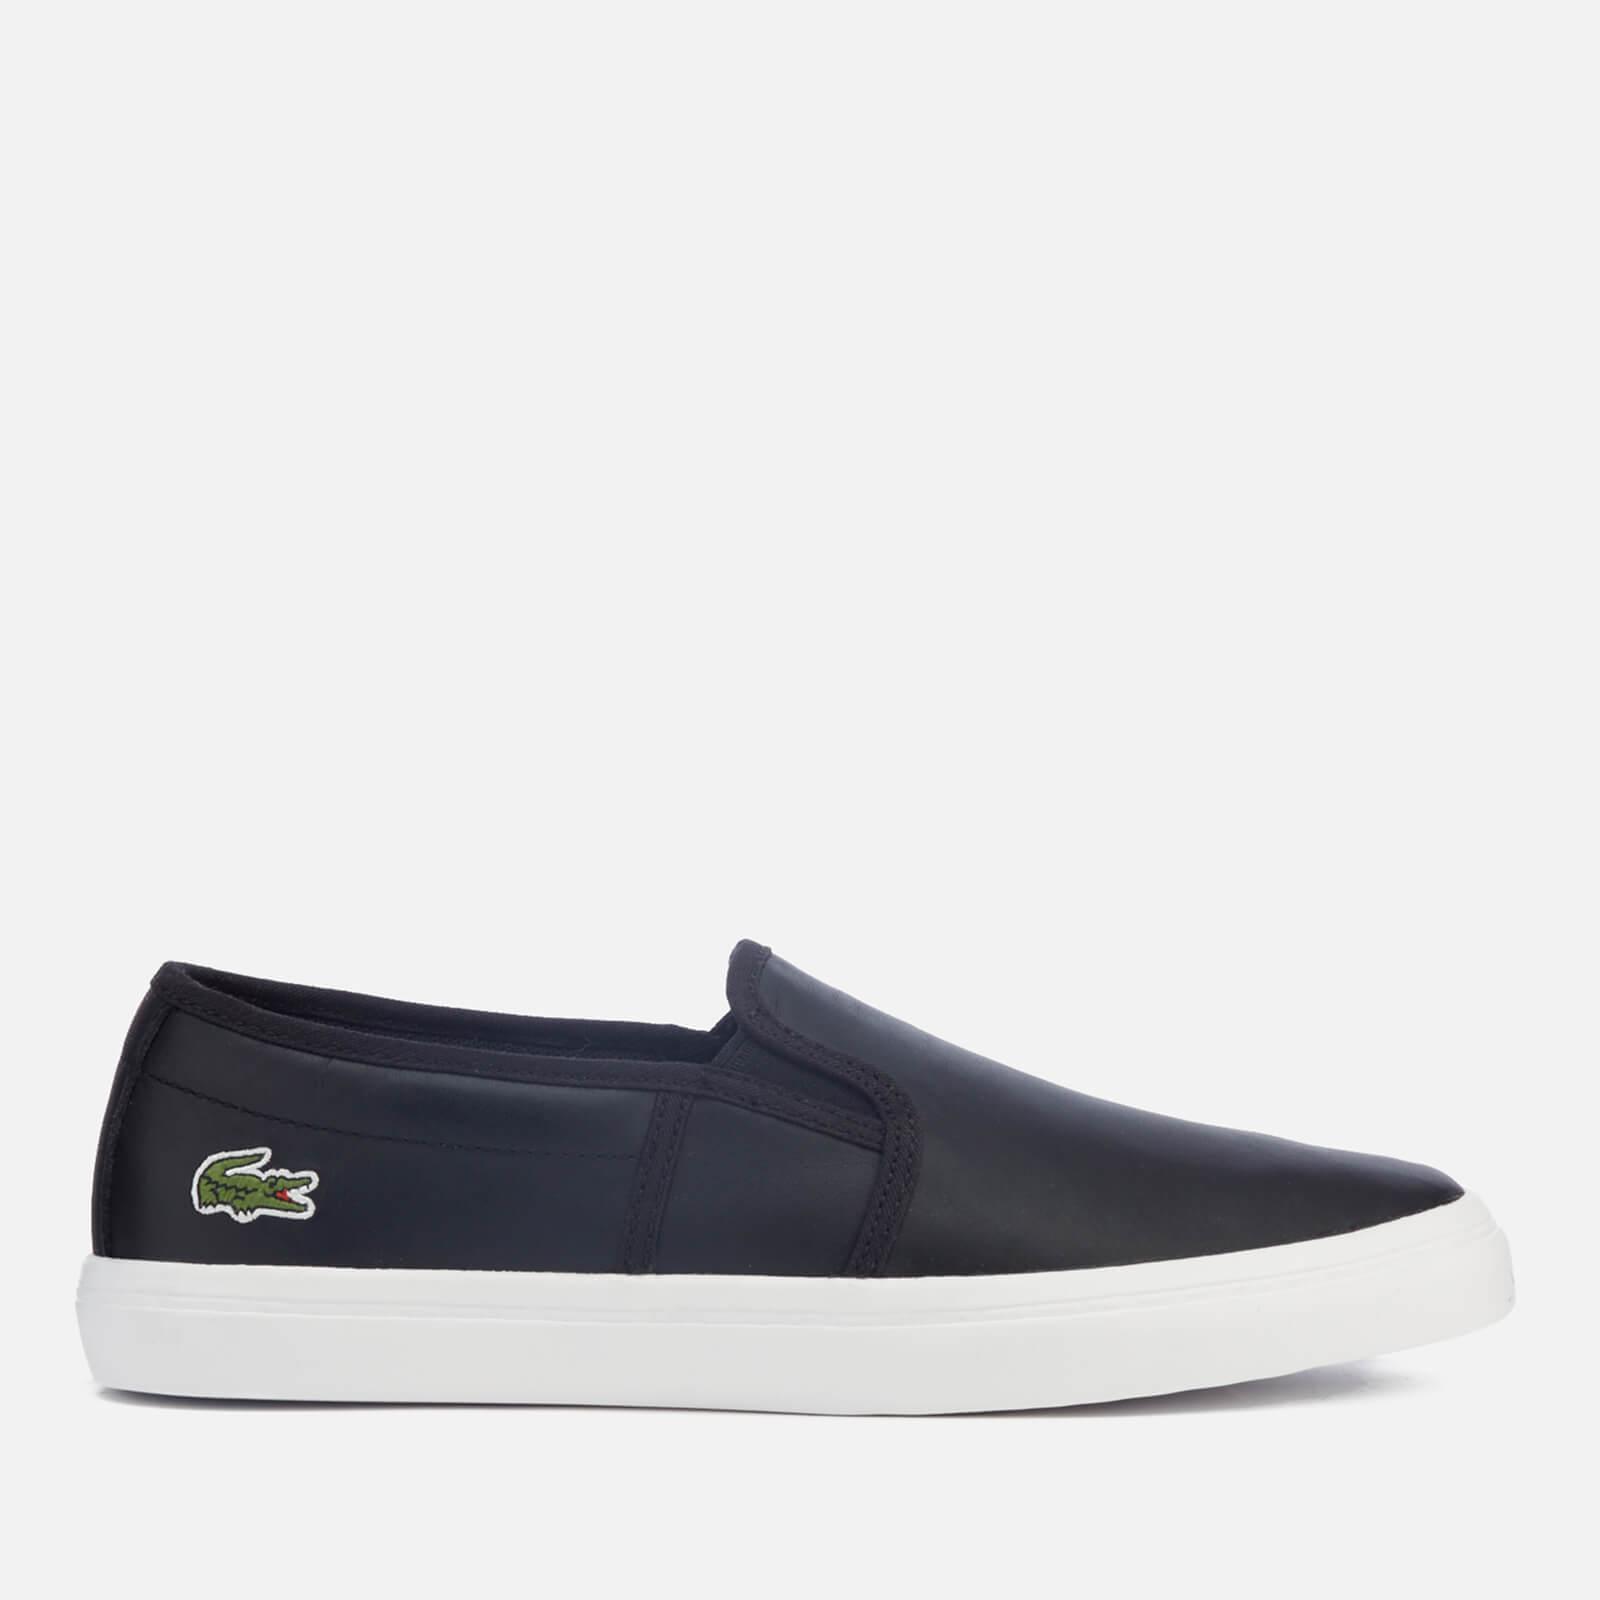 Avenir Slip 318 2 SPW Slip On Sneakers mc3yxozL